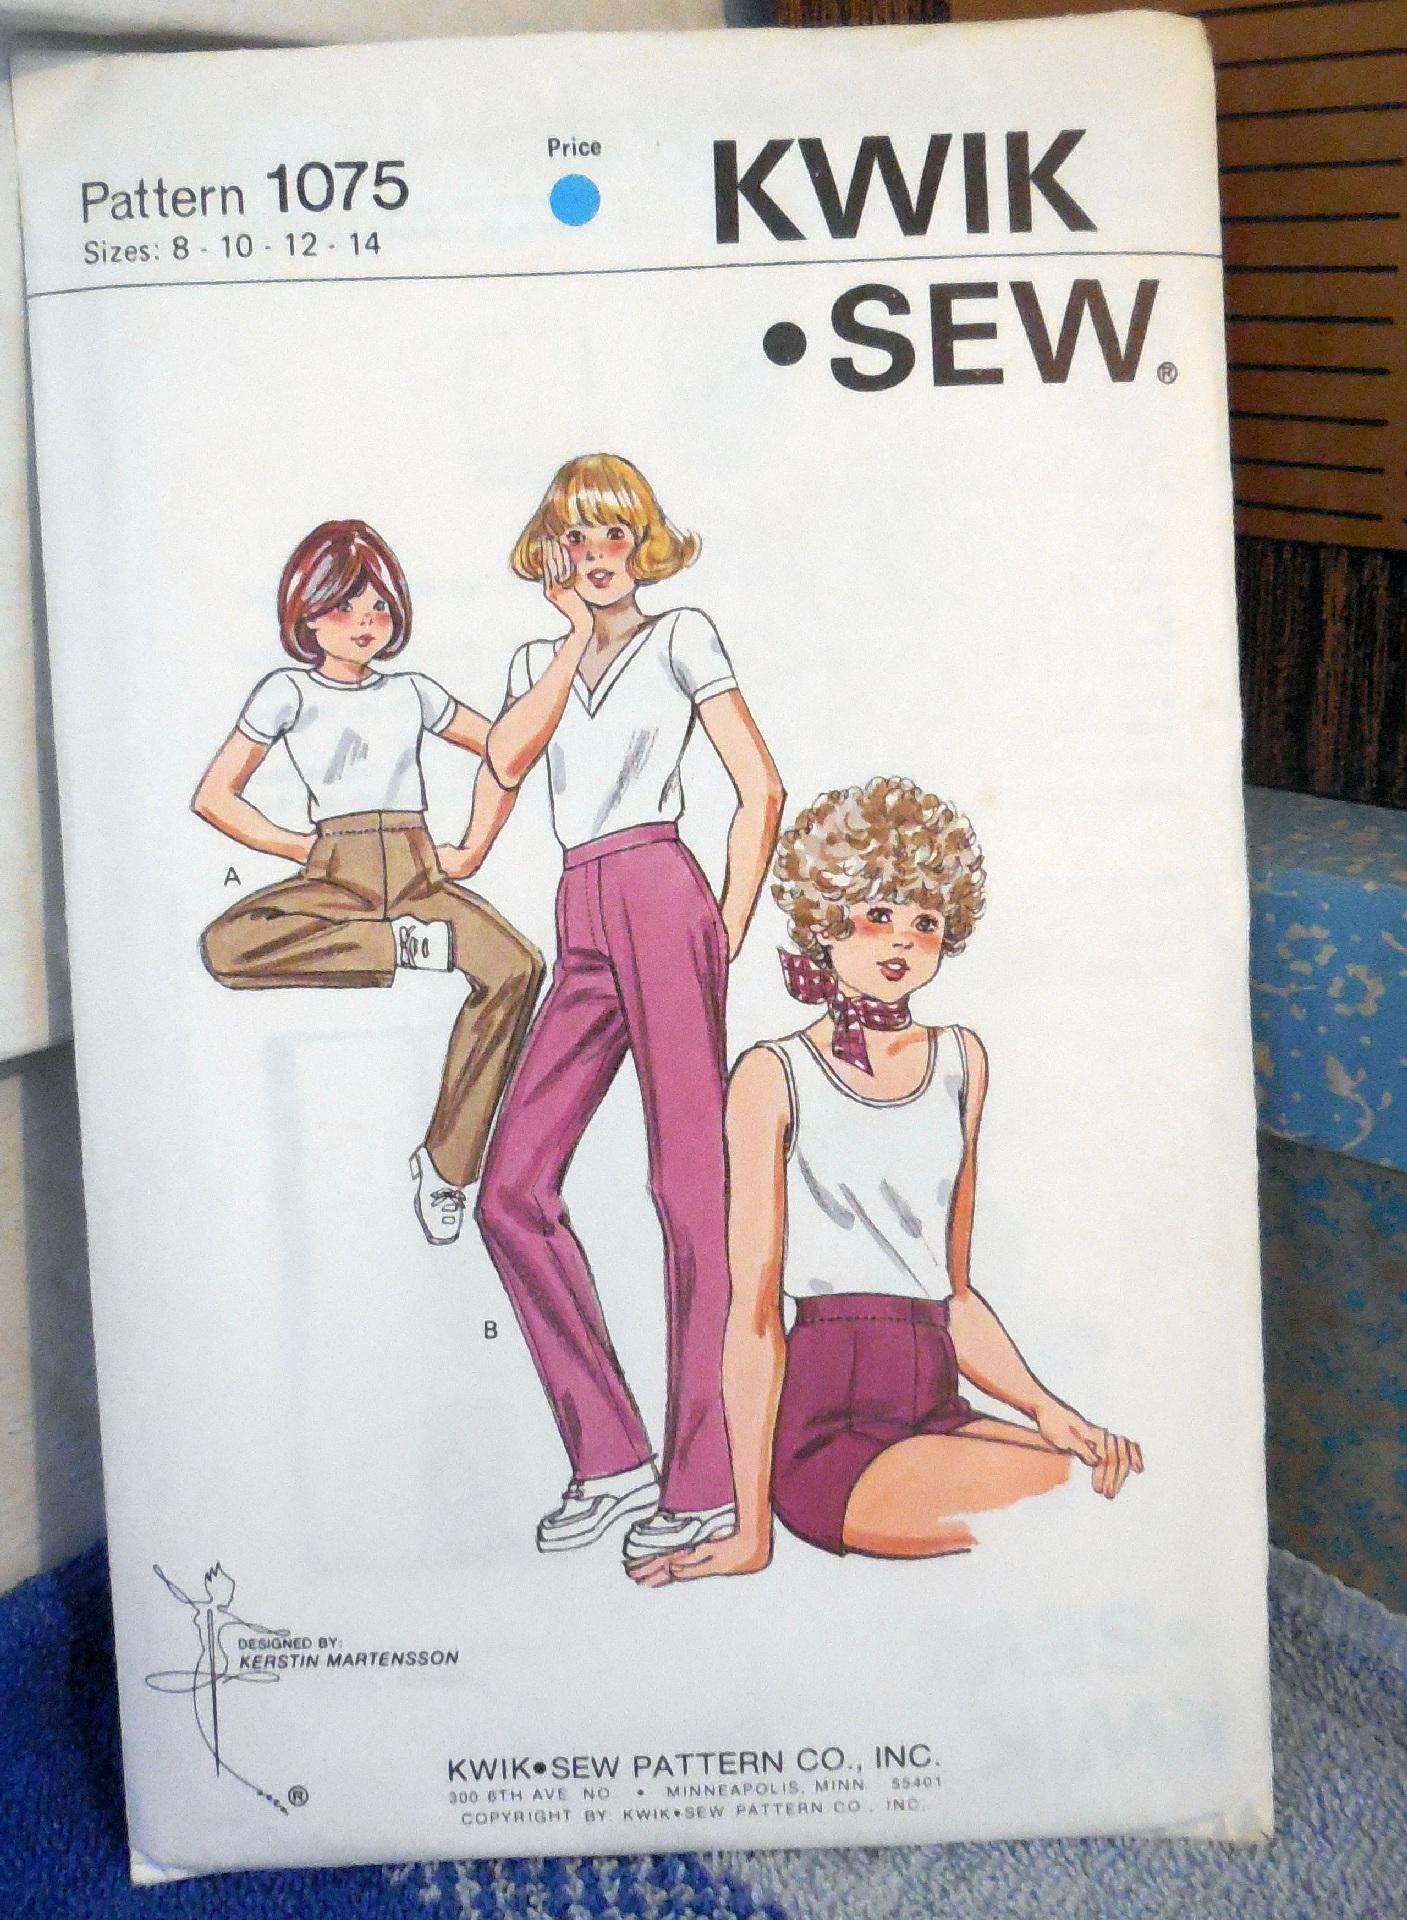 Kwik Sew 1075